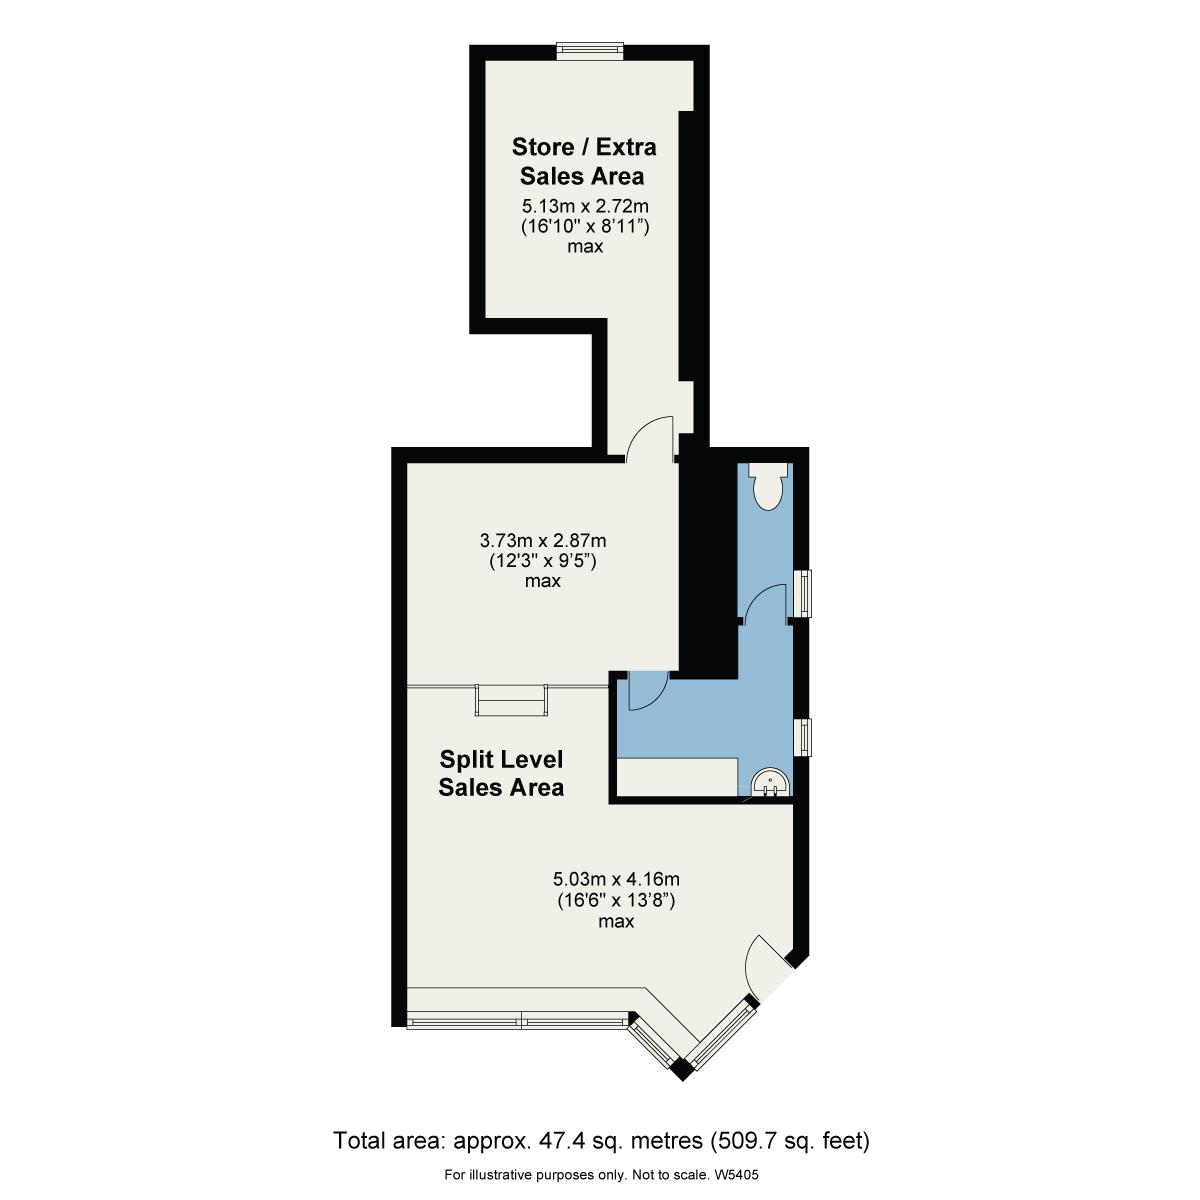 Floorplan 26, Main Road, Windermere, Cumbria, LA23 1DY